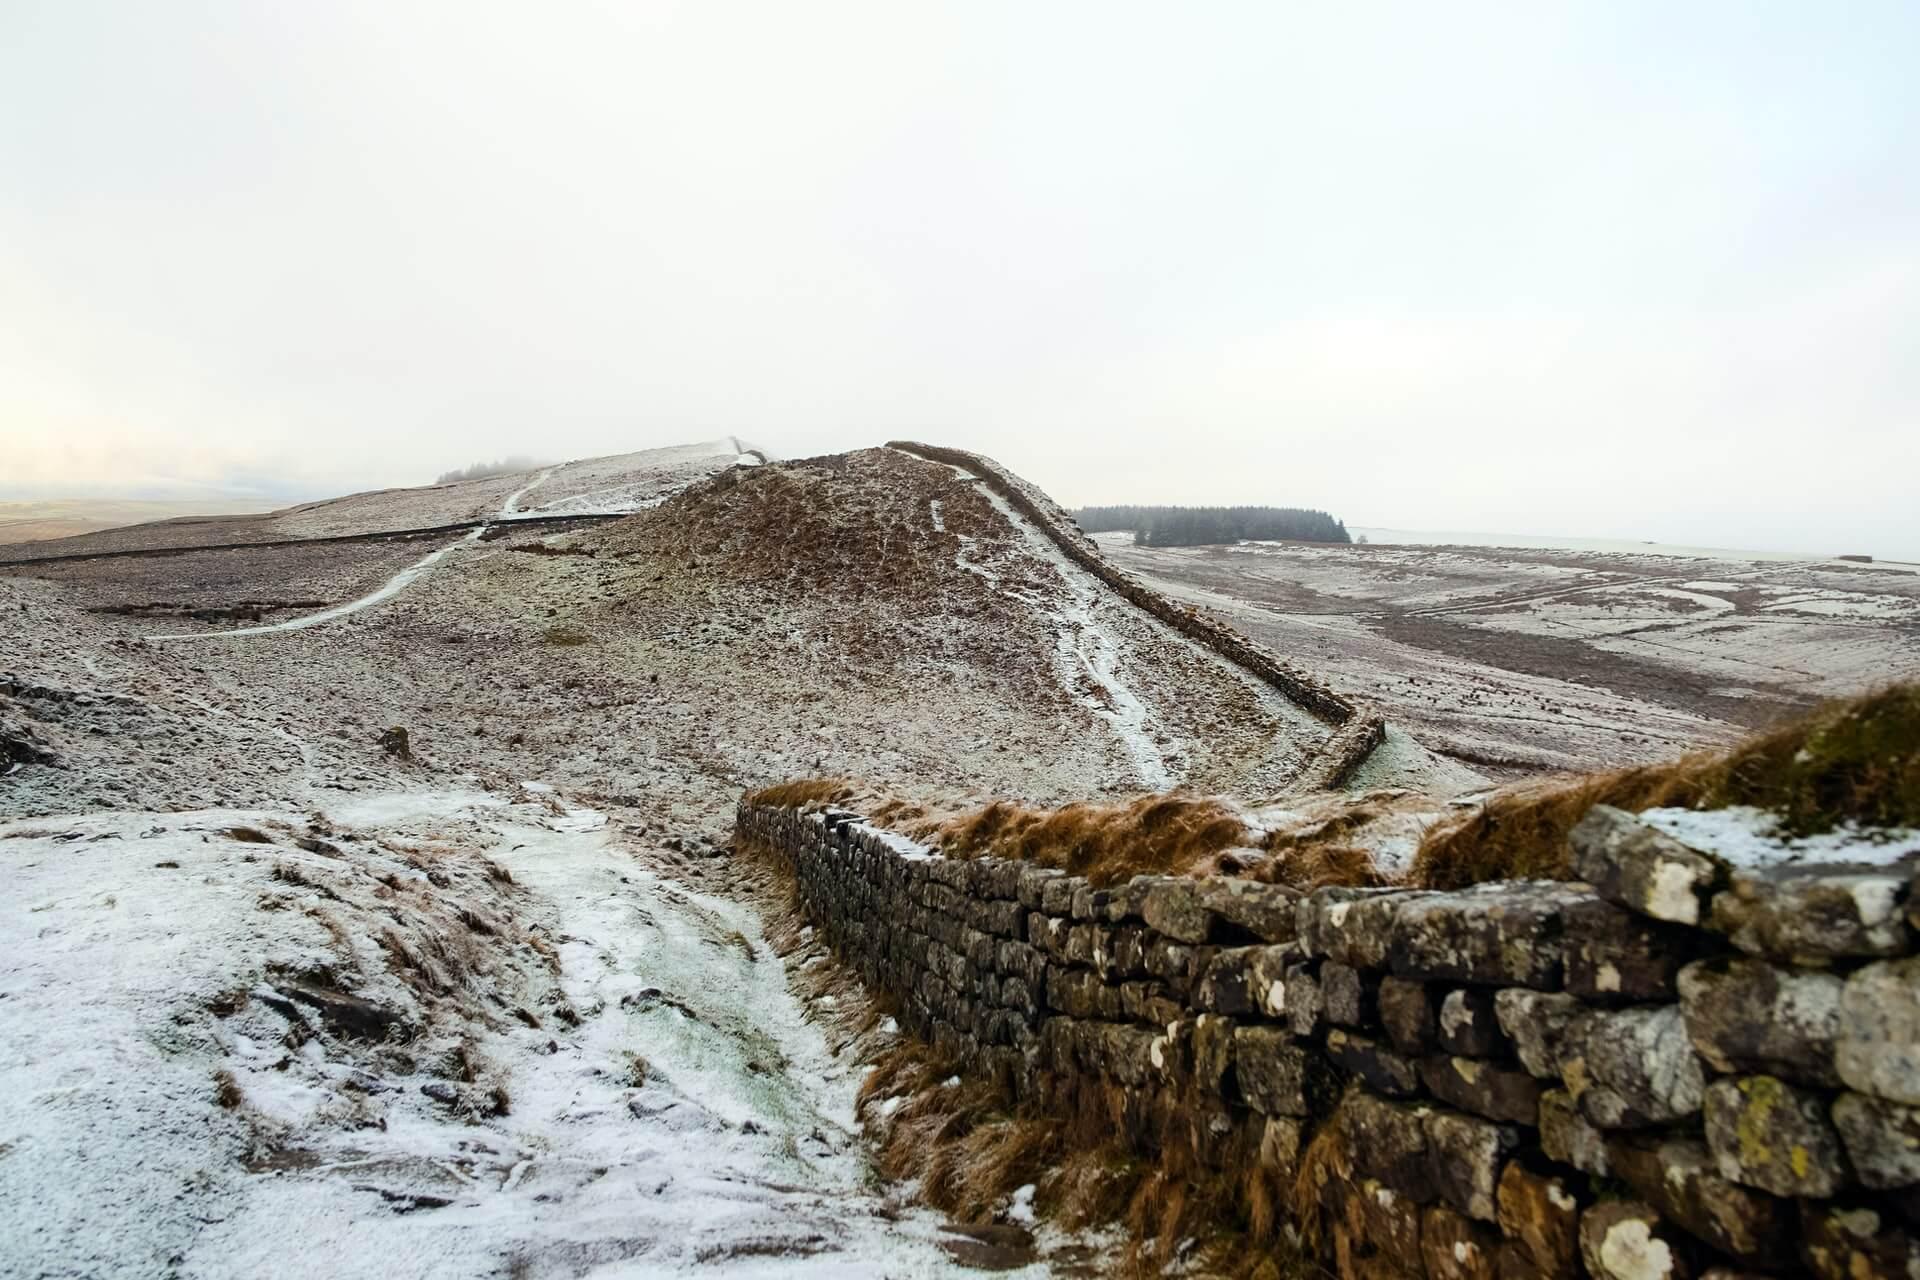 Photograph of Hadrian's Wall Path